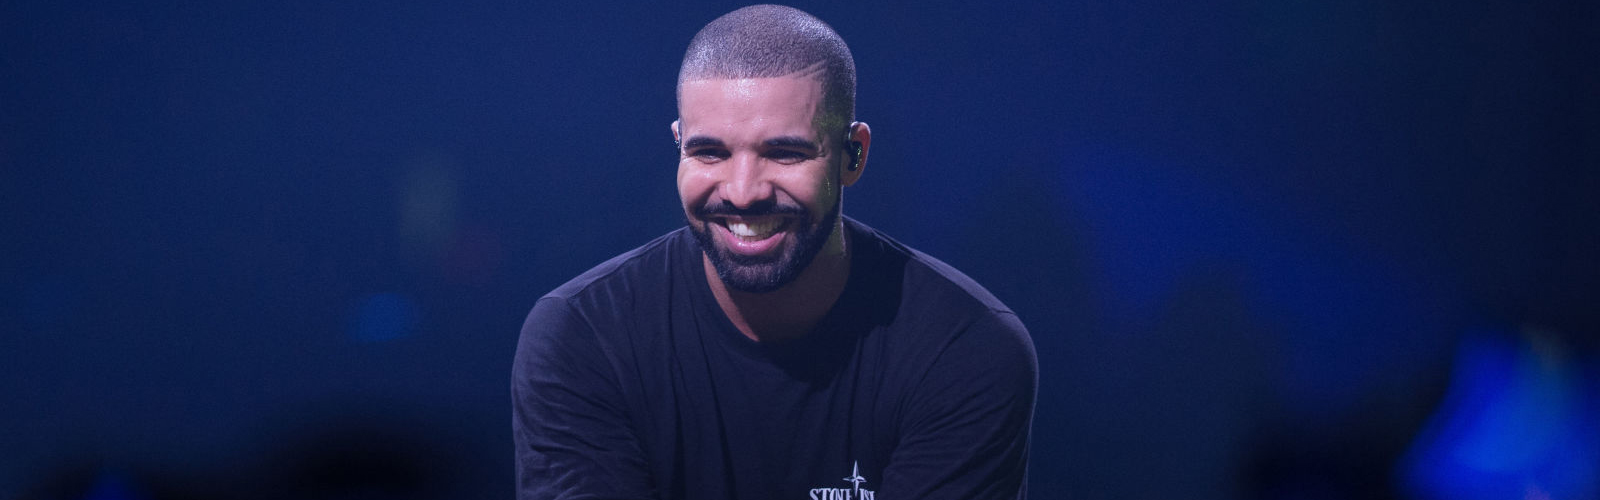 Drakeheader